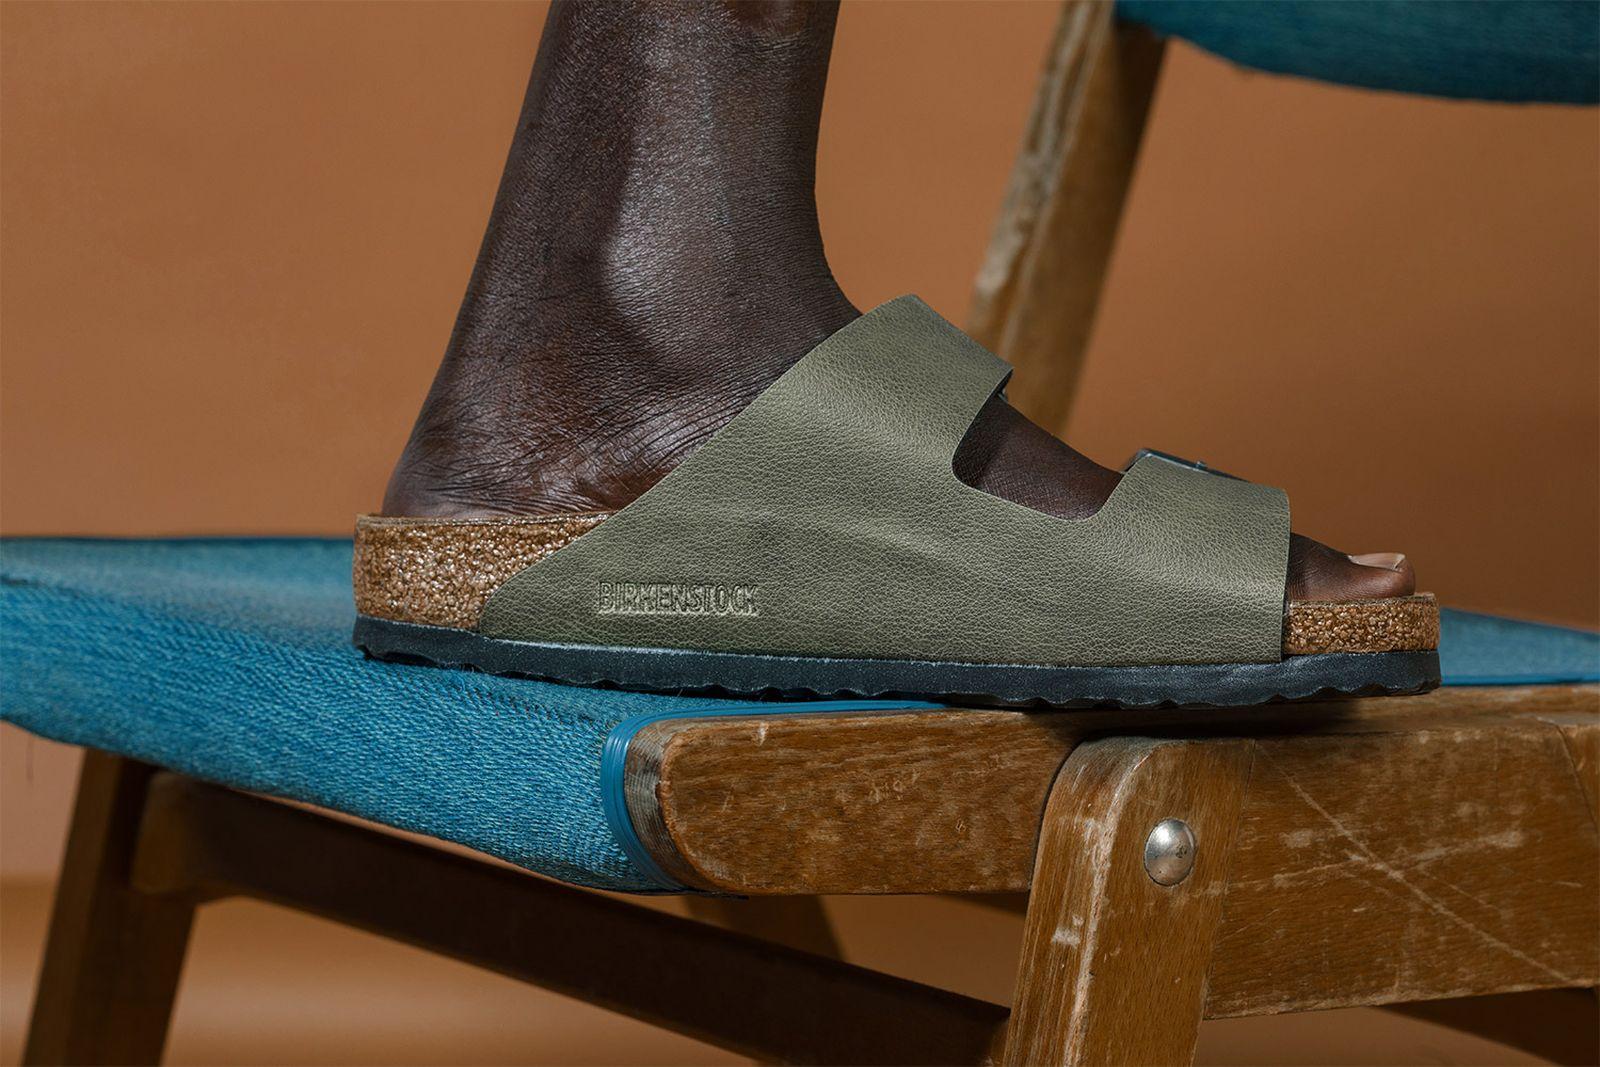 birkenstock-sandals-history-design-fashion-06